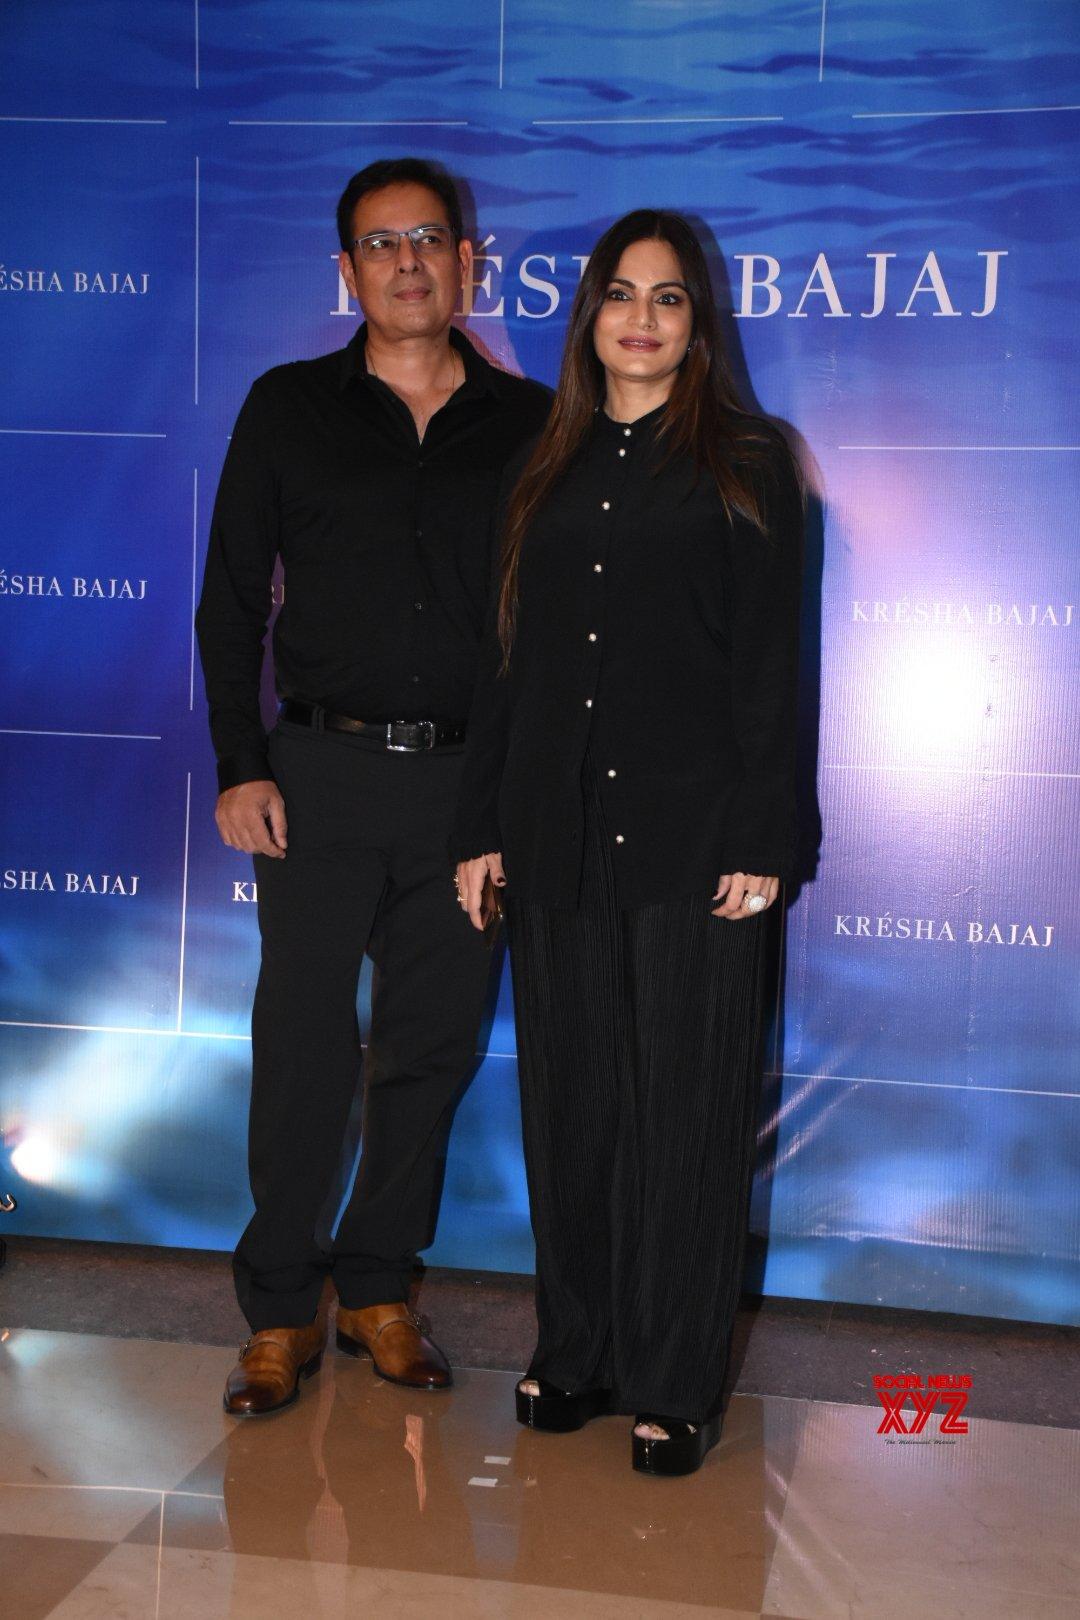 Salman Khan And Other Celebs At Kresha Bajaj Store First Anniversary Celebrations And Fashion Show At Bandra Gallery Set 1